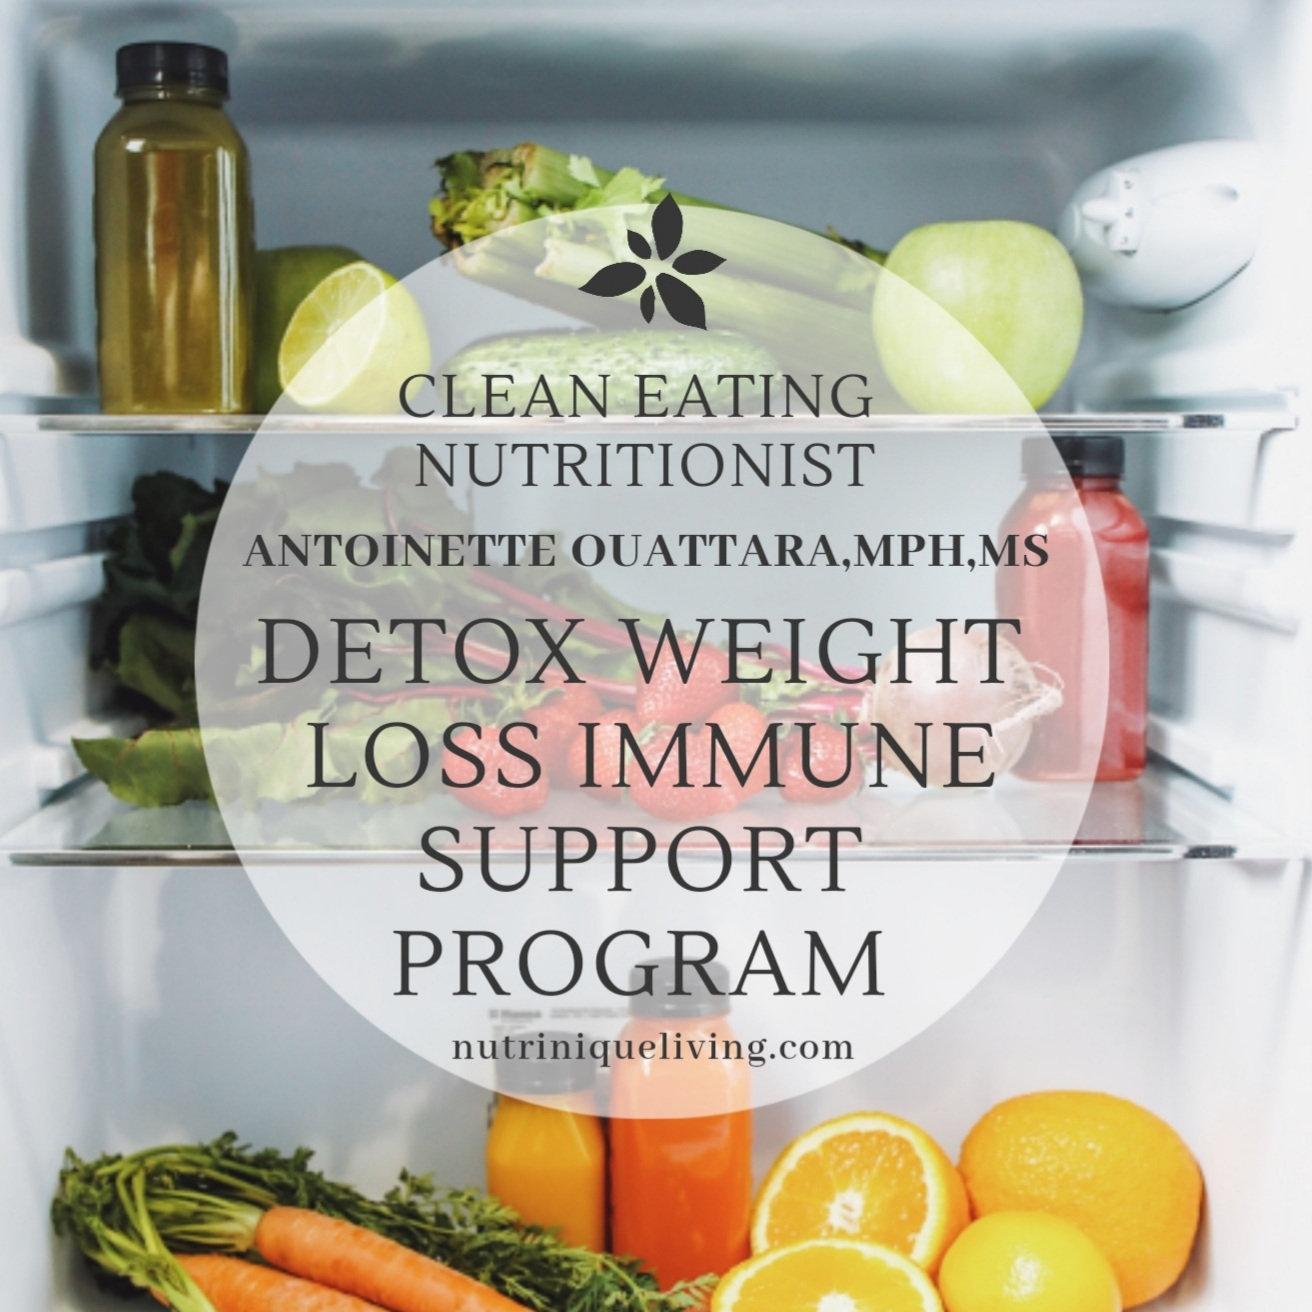 Detox Weight Loss Immune Support Program